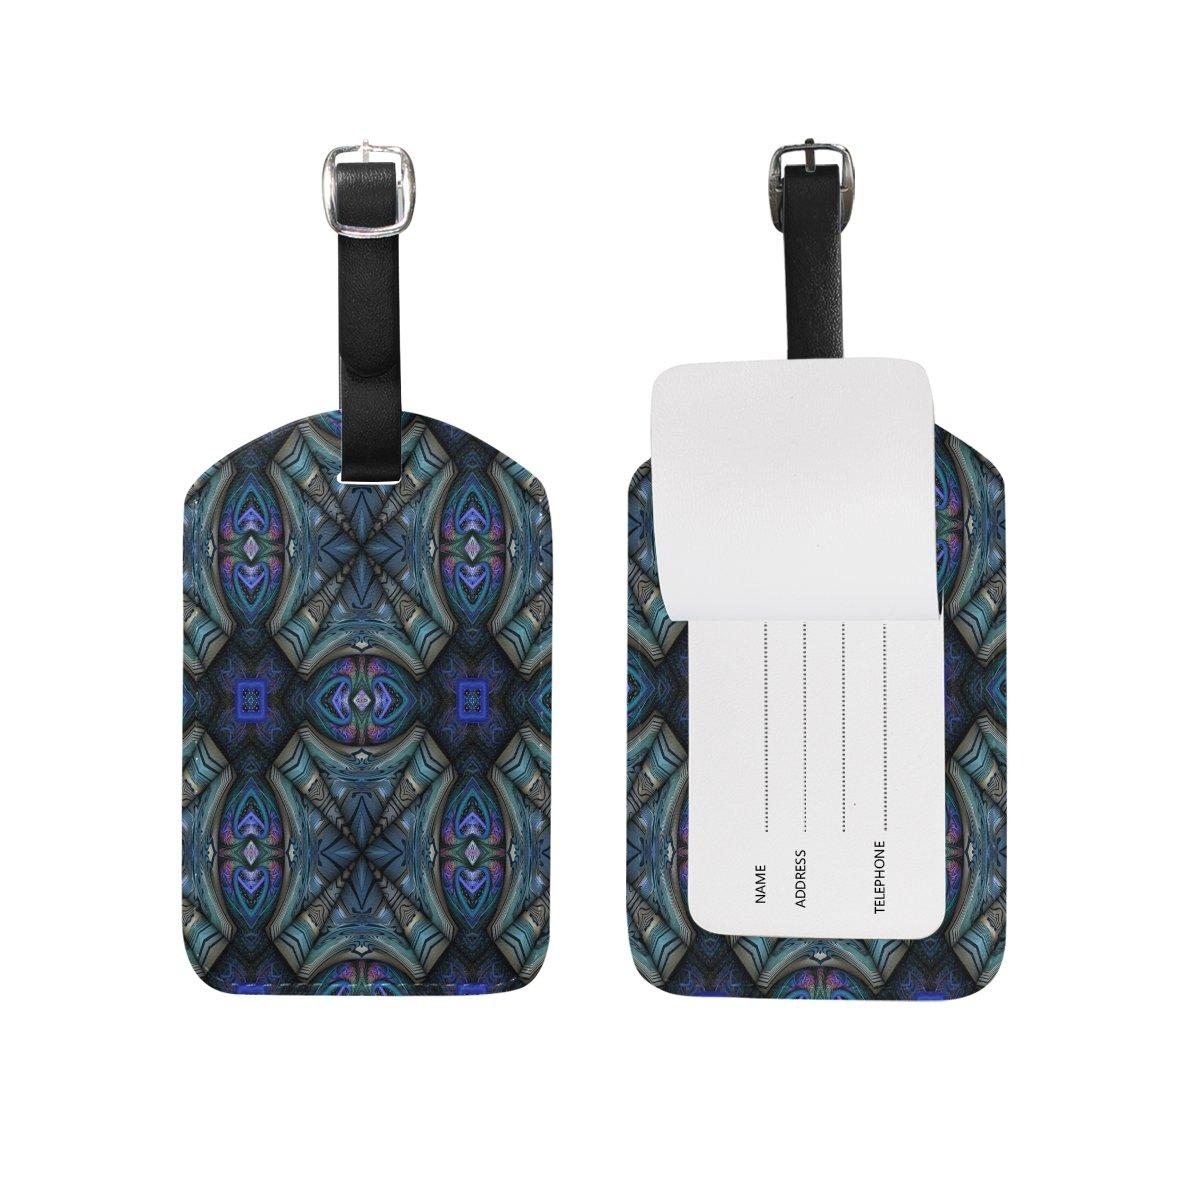 Saobao Travel Luggage Tag Kaleidoscopic Wallpaper Tiles PU Leather Baggage Suitcase Travel ID Bag Tag 1Pcs